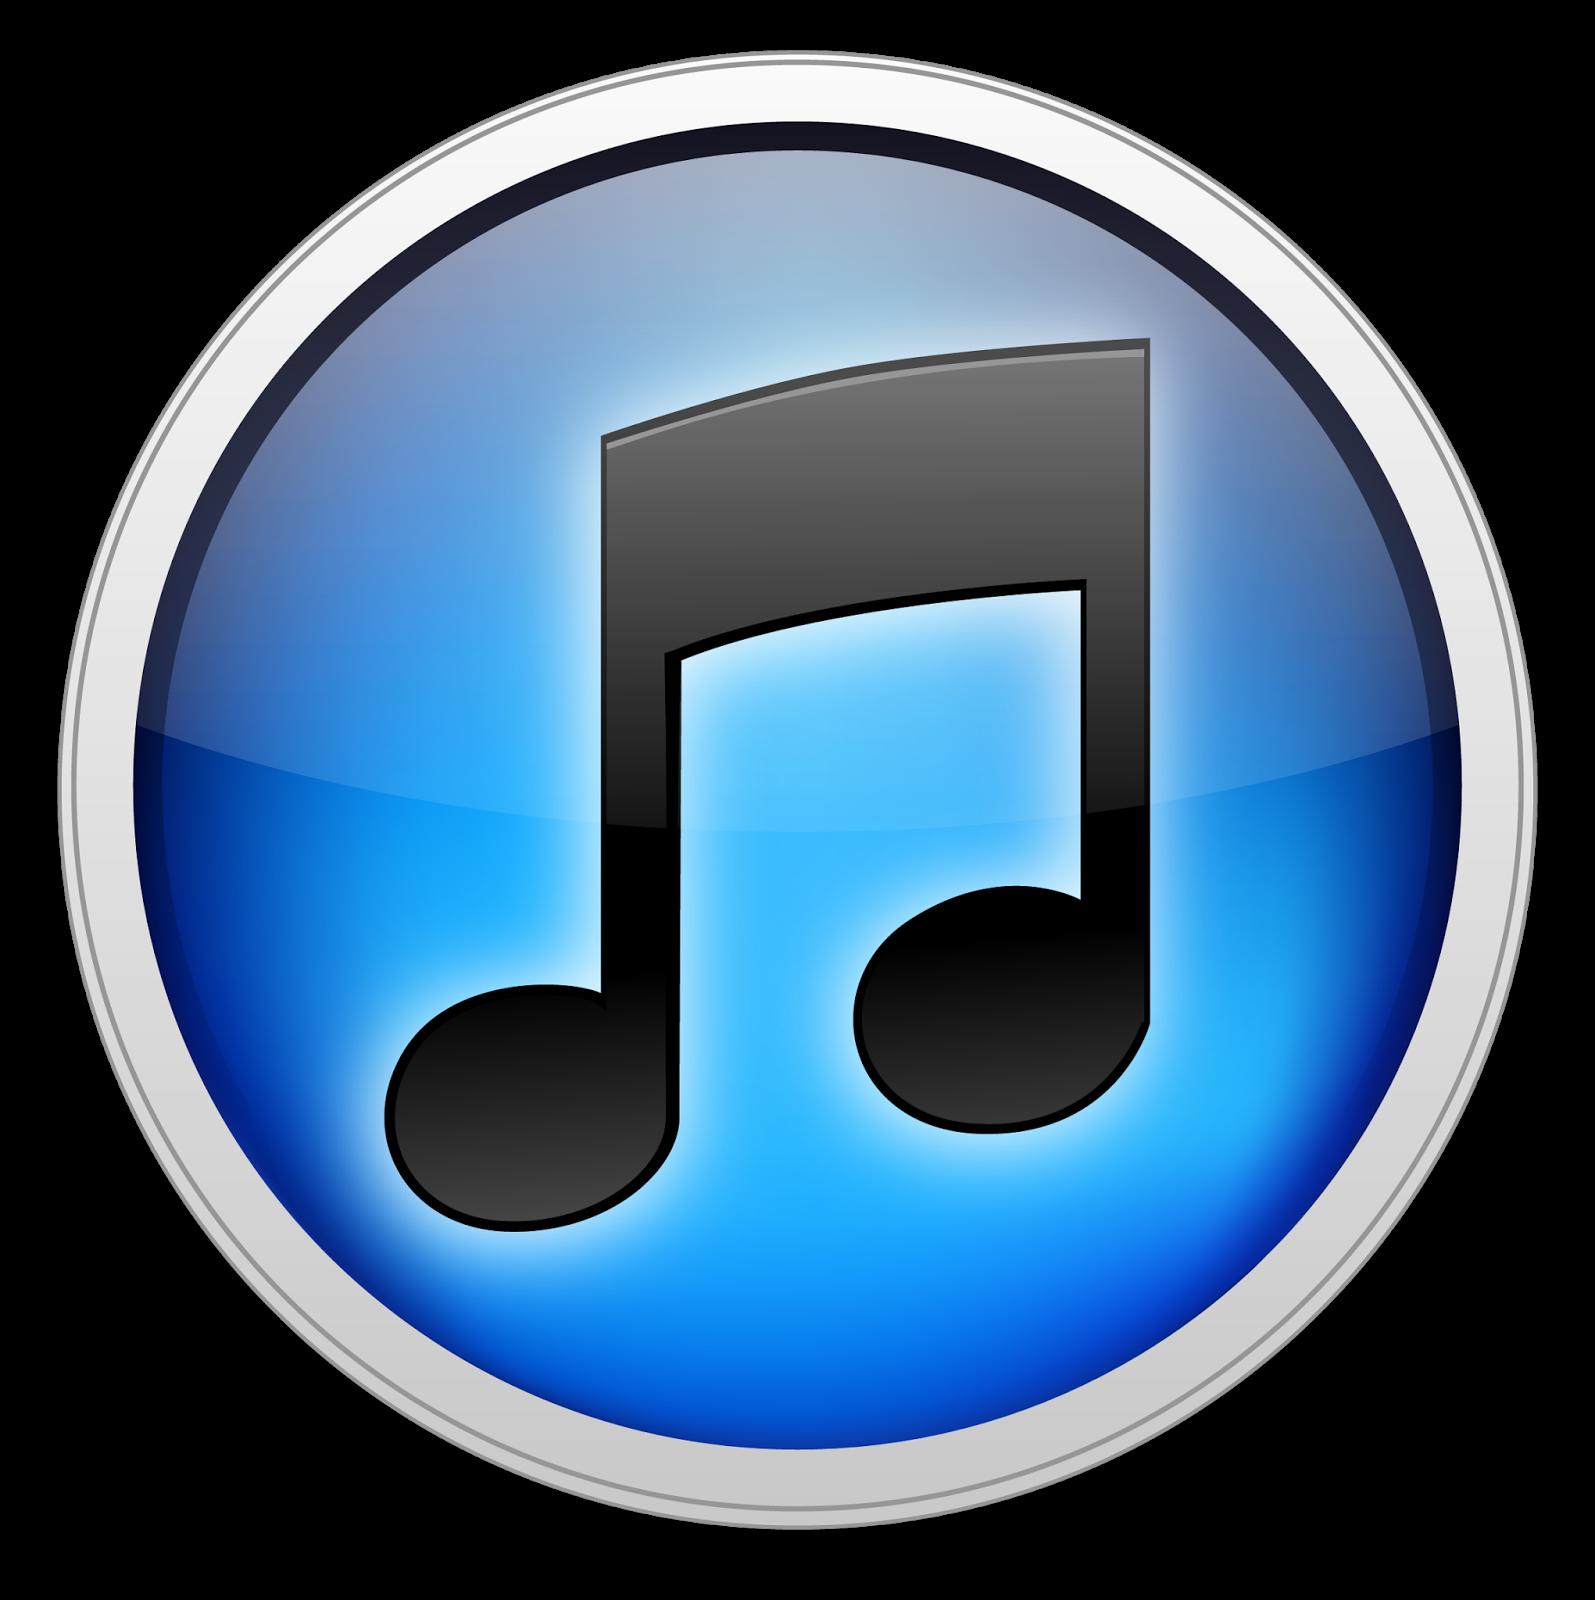 Itunes software download status